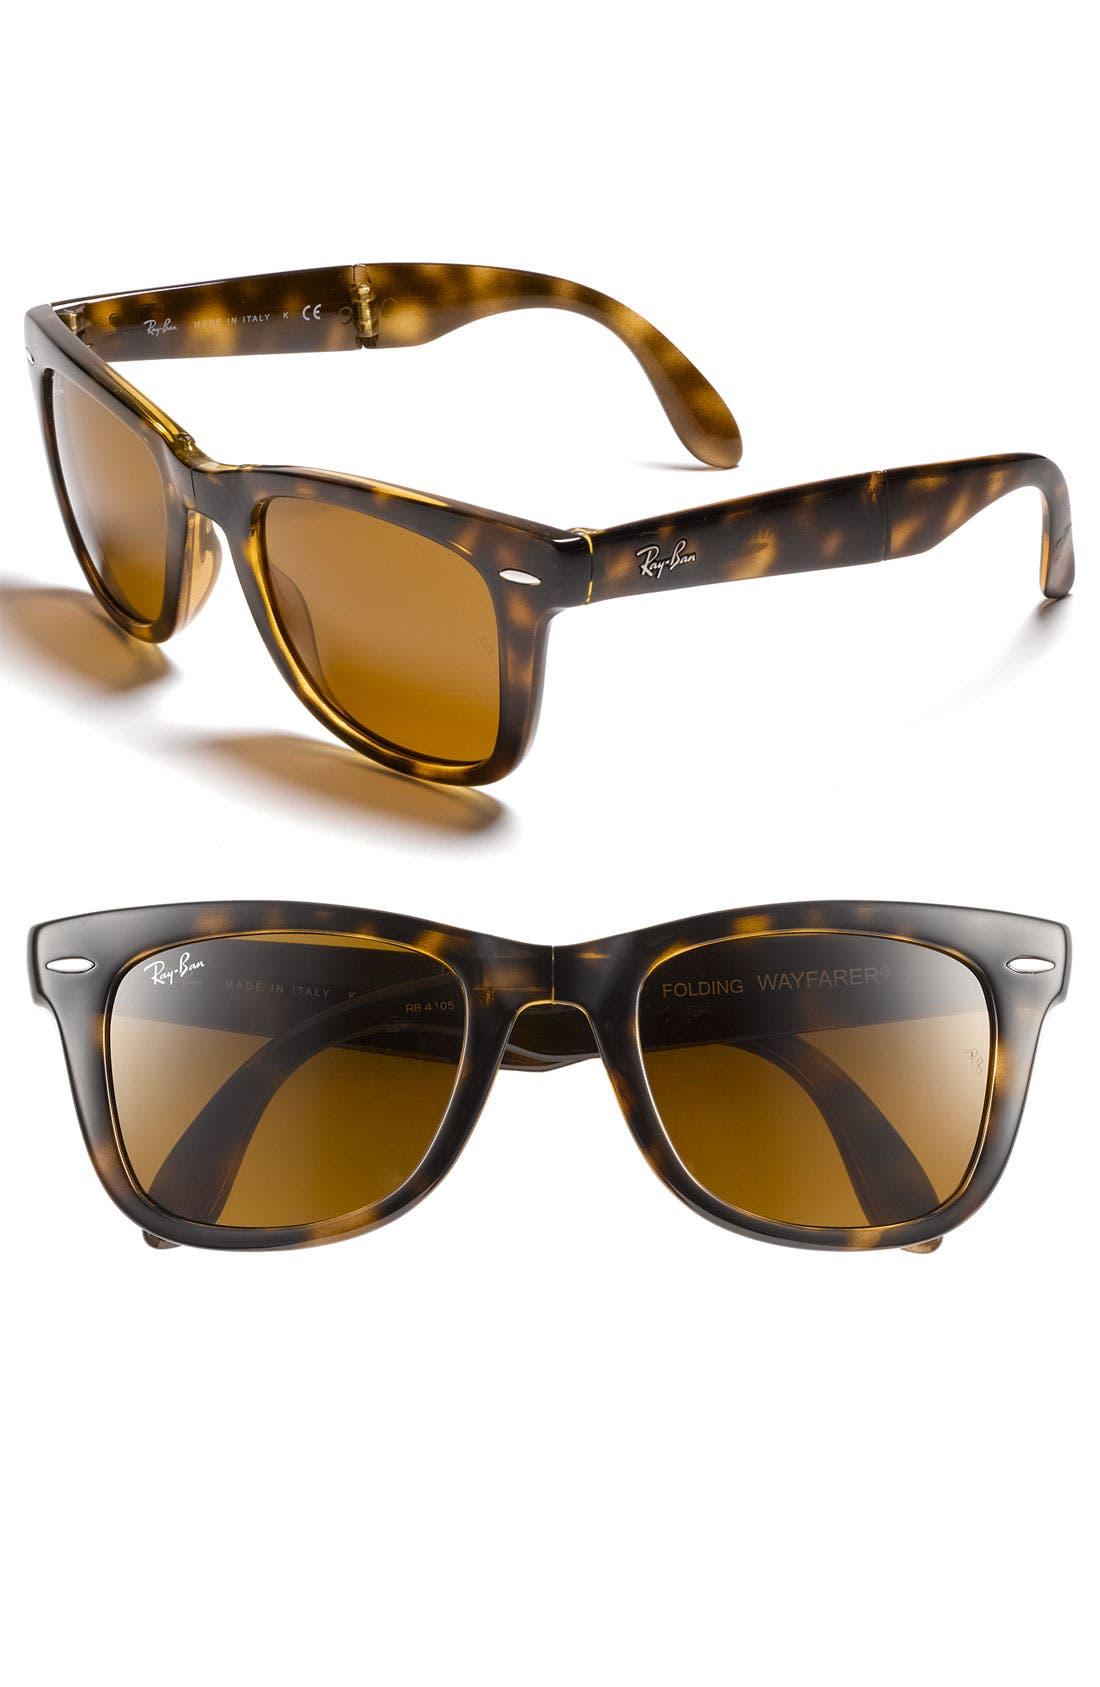 Alternate Image 1 Selected - Ray-Ban Standard 50mm Folding Wayfarer Sunglasses